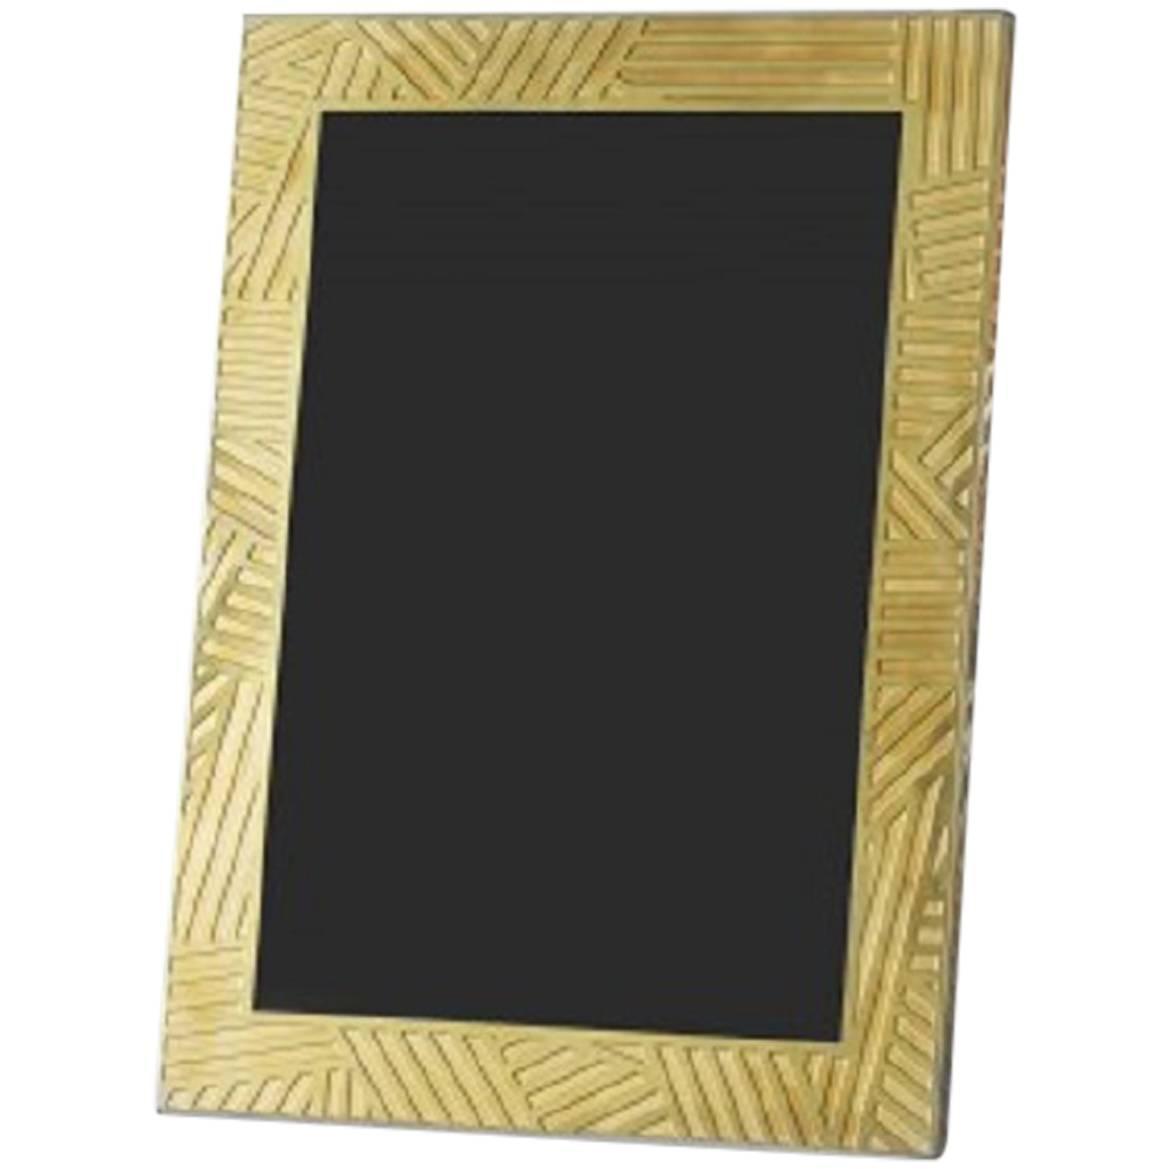 lara bohinc the wilkinson series large brass frame at. Black Bedroom Furniture Sets. Home Design Ideas